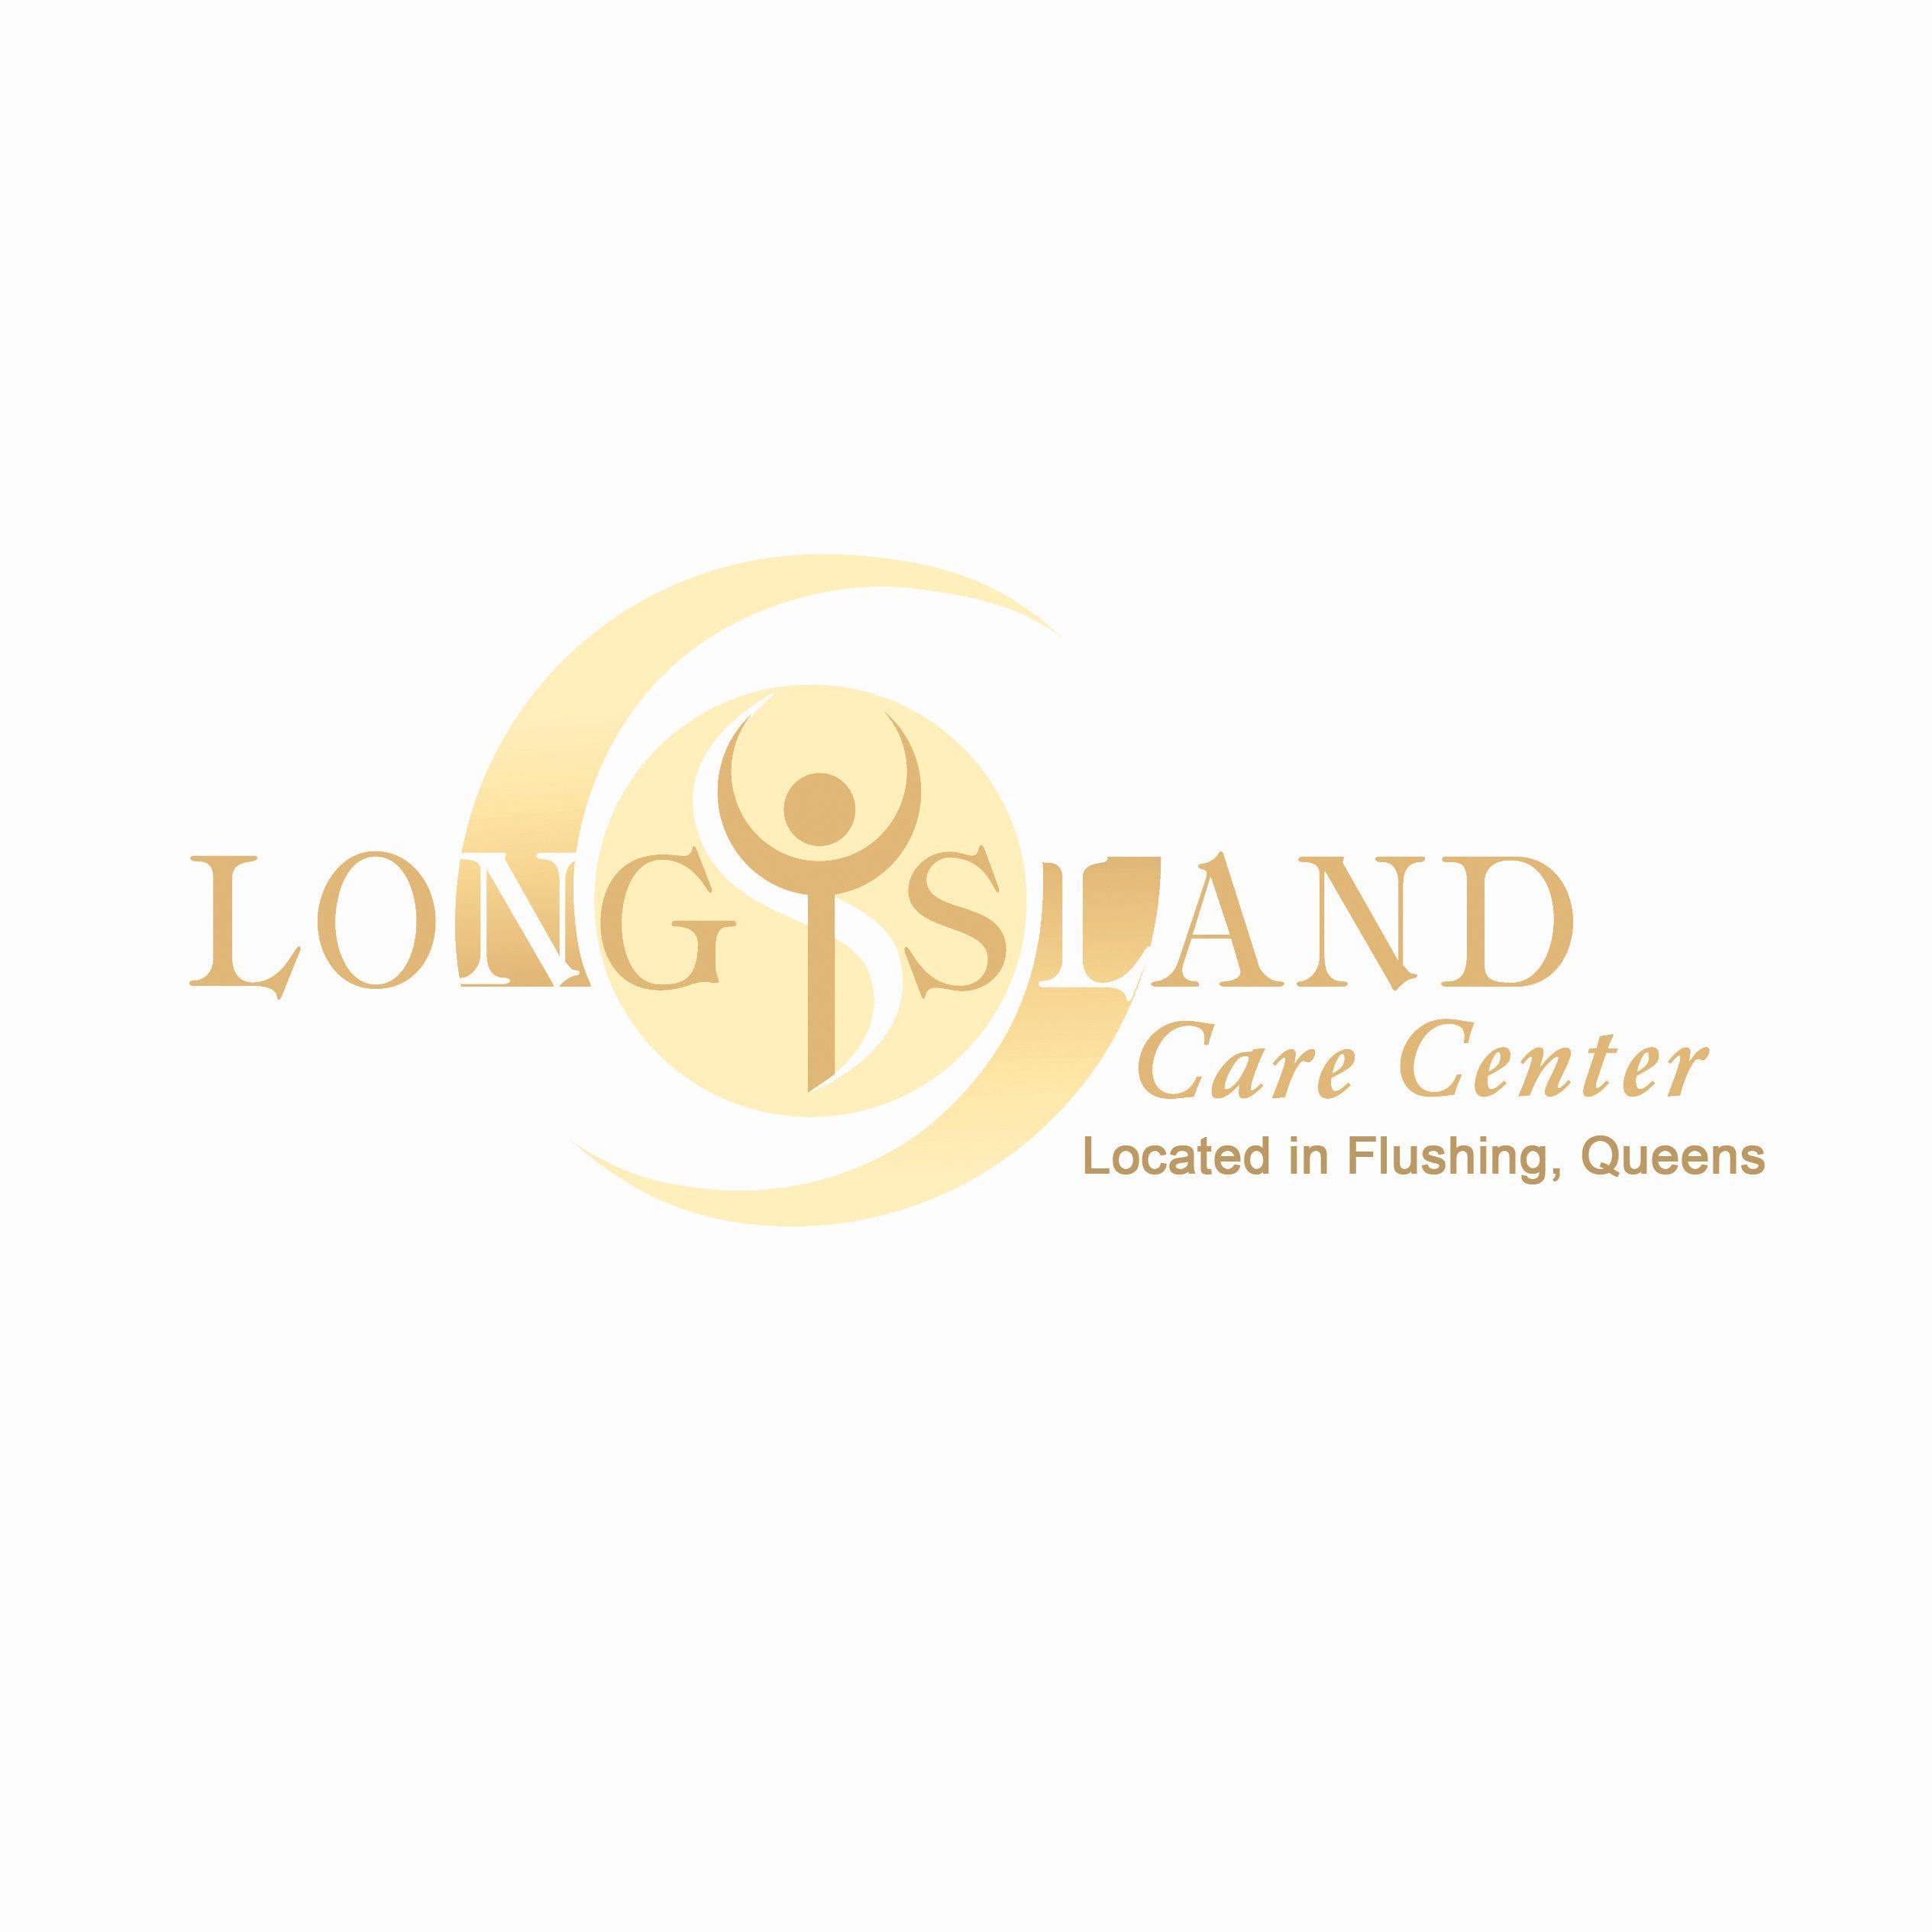 Long Island Care Center image 2